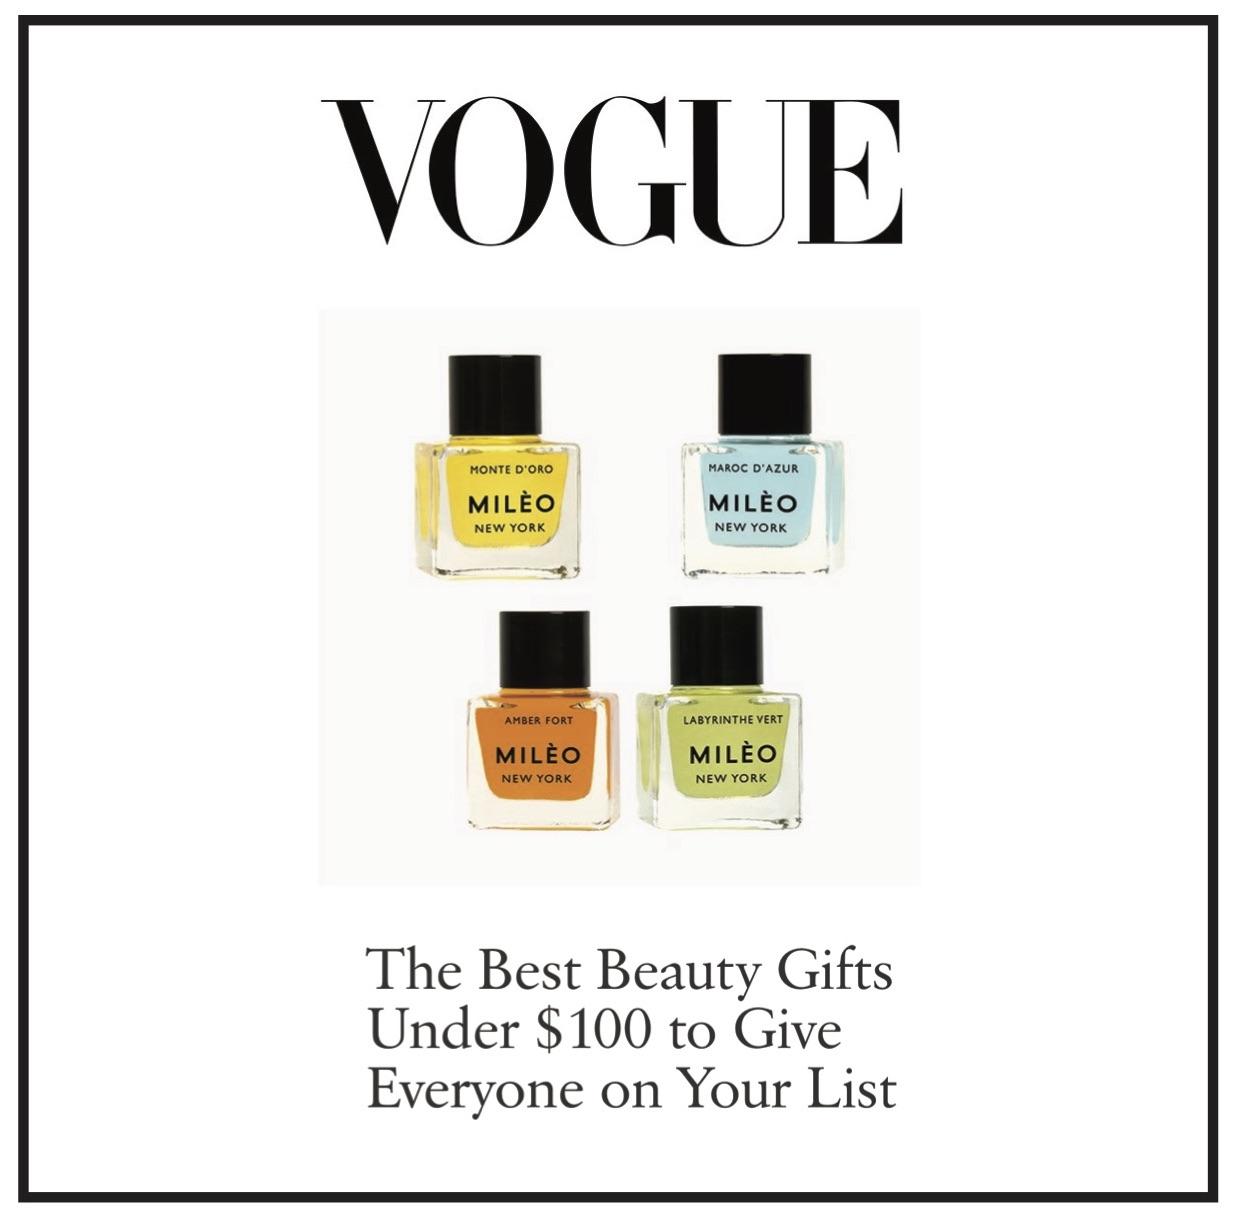 Mileo IG Post - Vogue - 11.19.18 .jpg